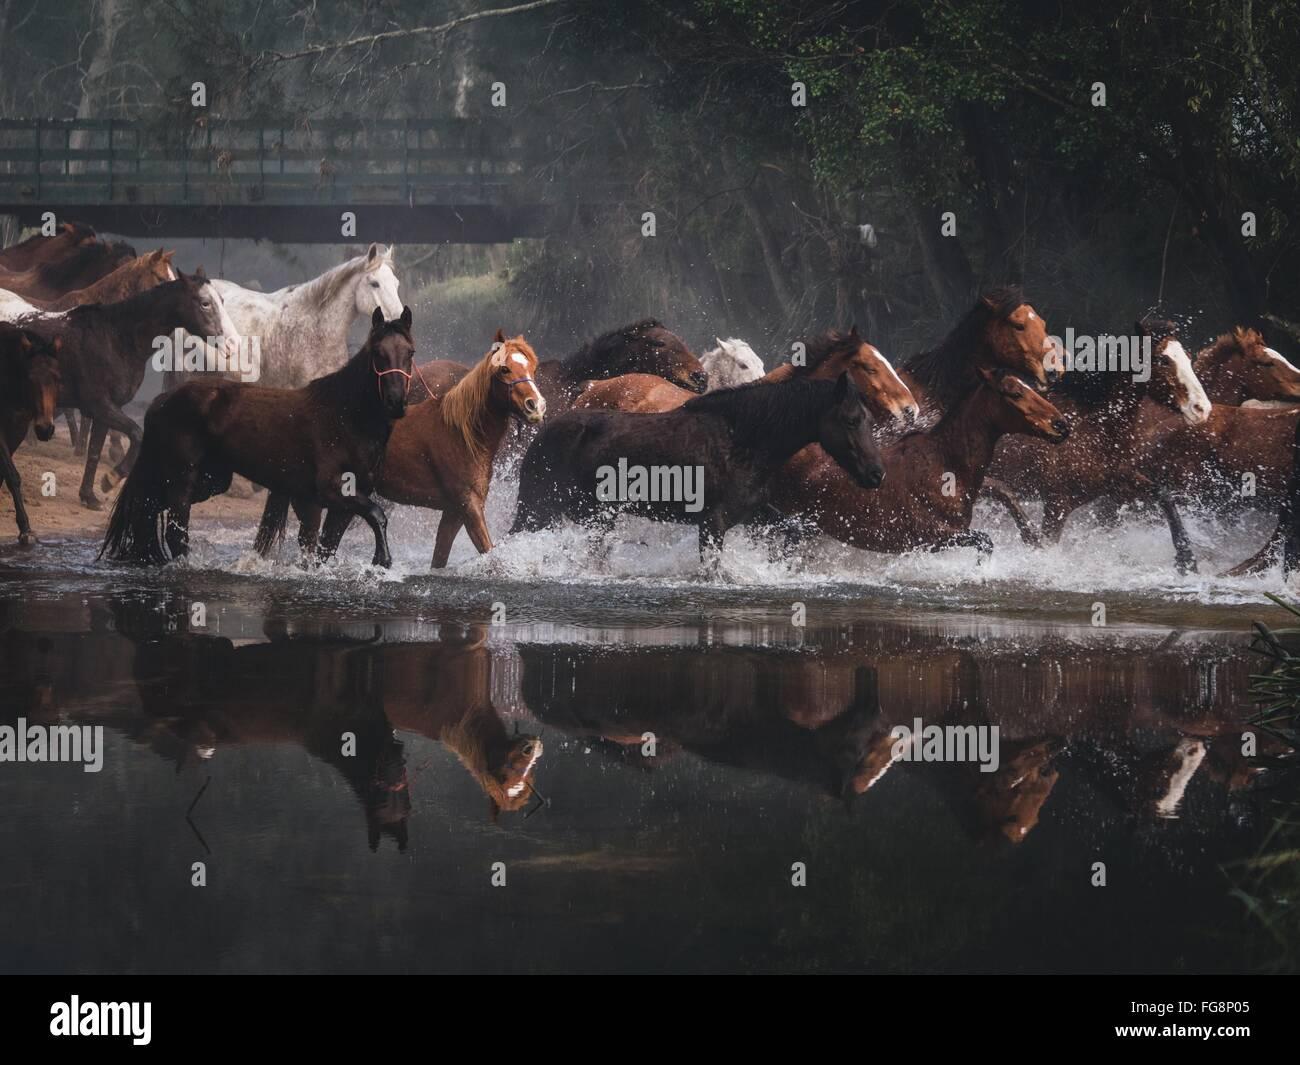 Horses Running On Lake - Stock Image